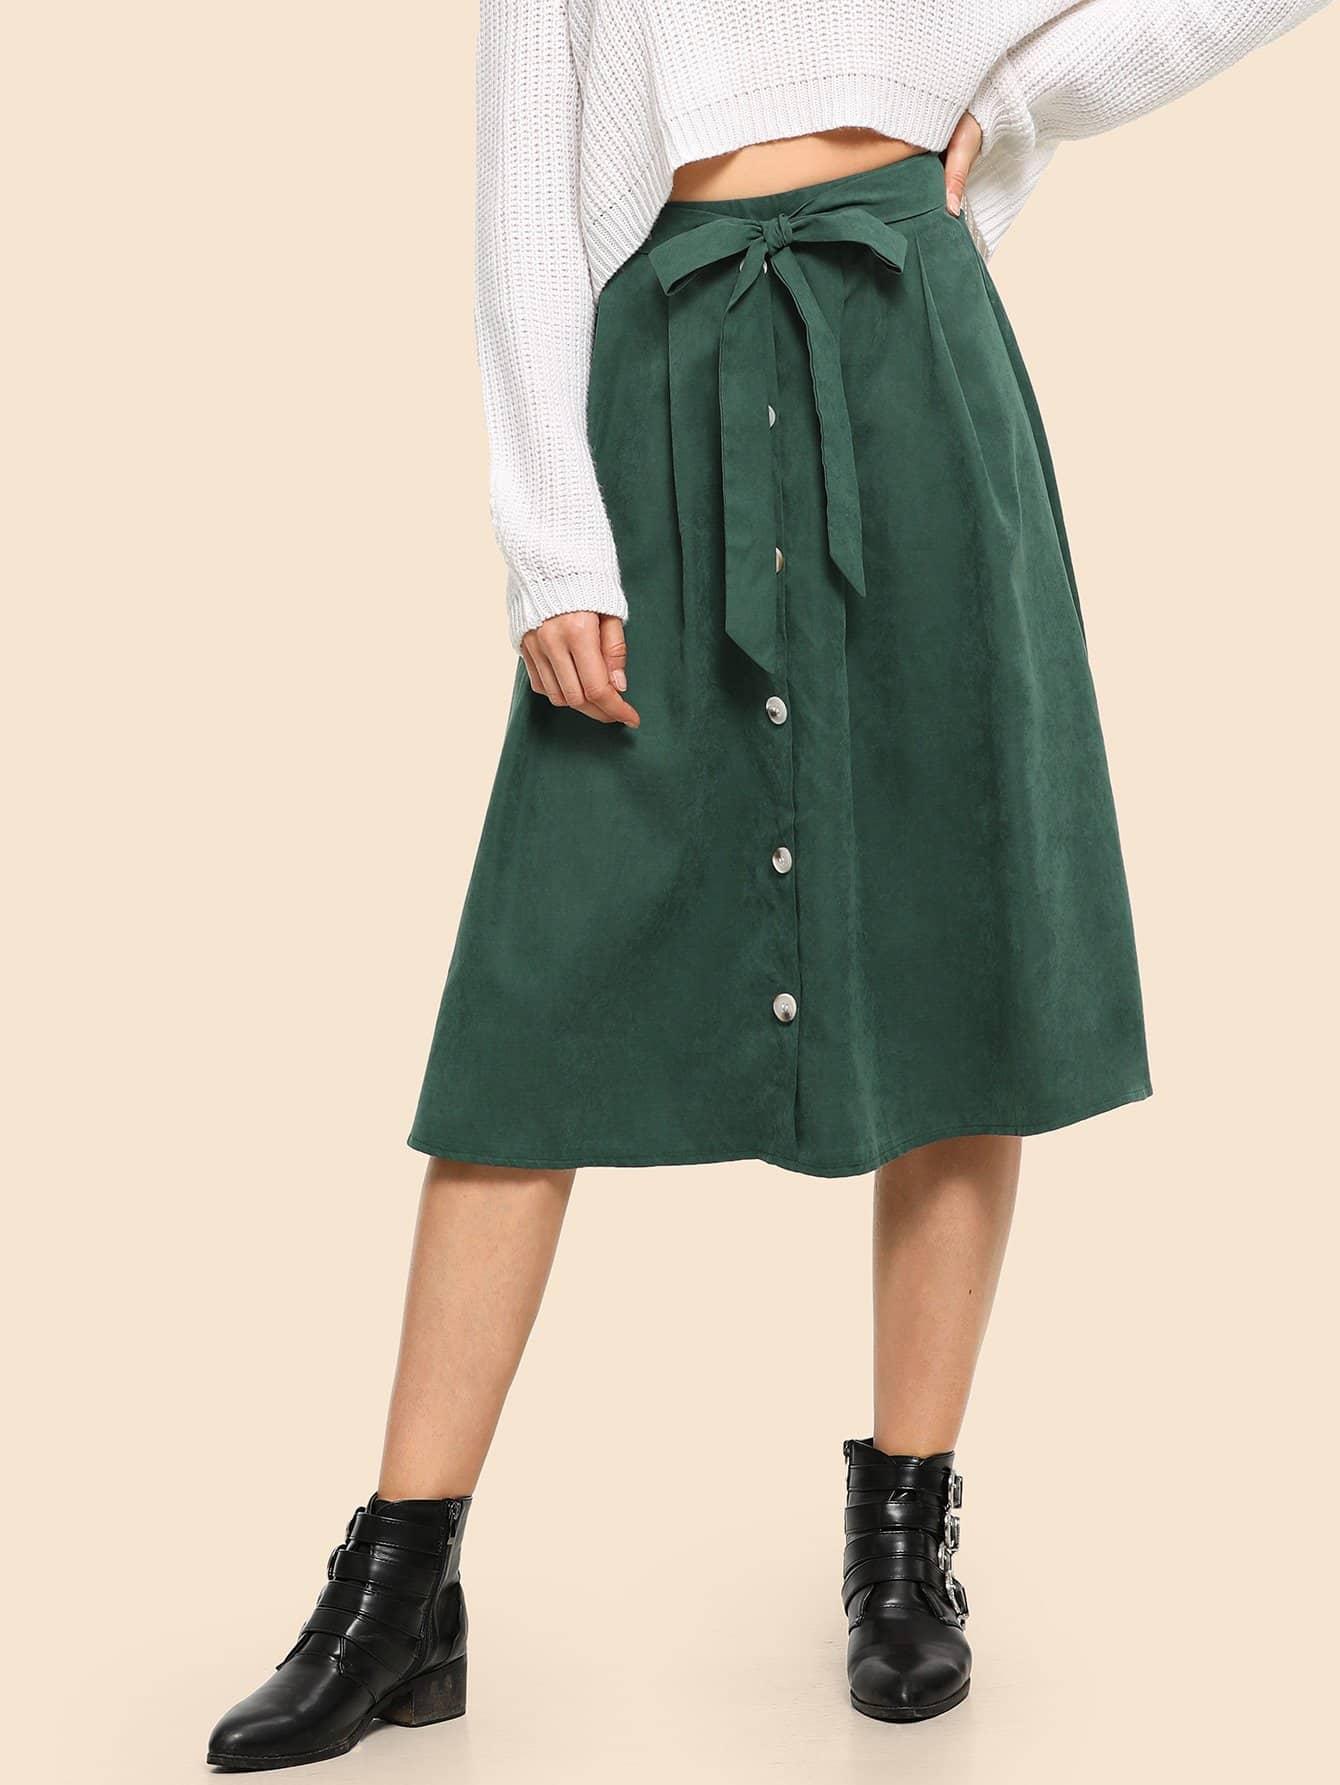 Фото - 80 'S юбка на пуговицах с поясом от SheIn зеленого цвета